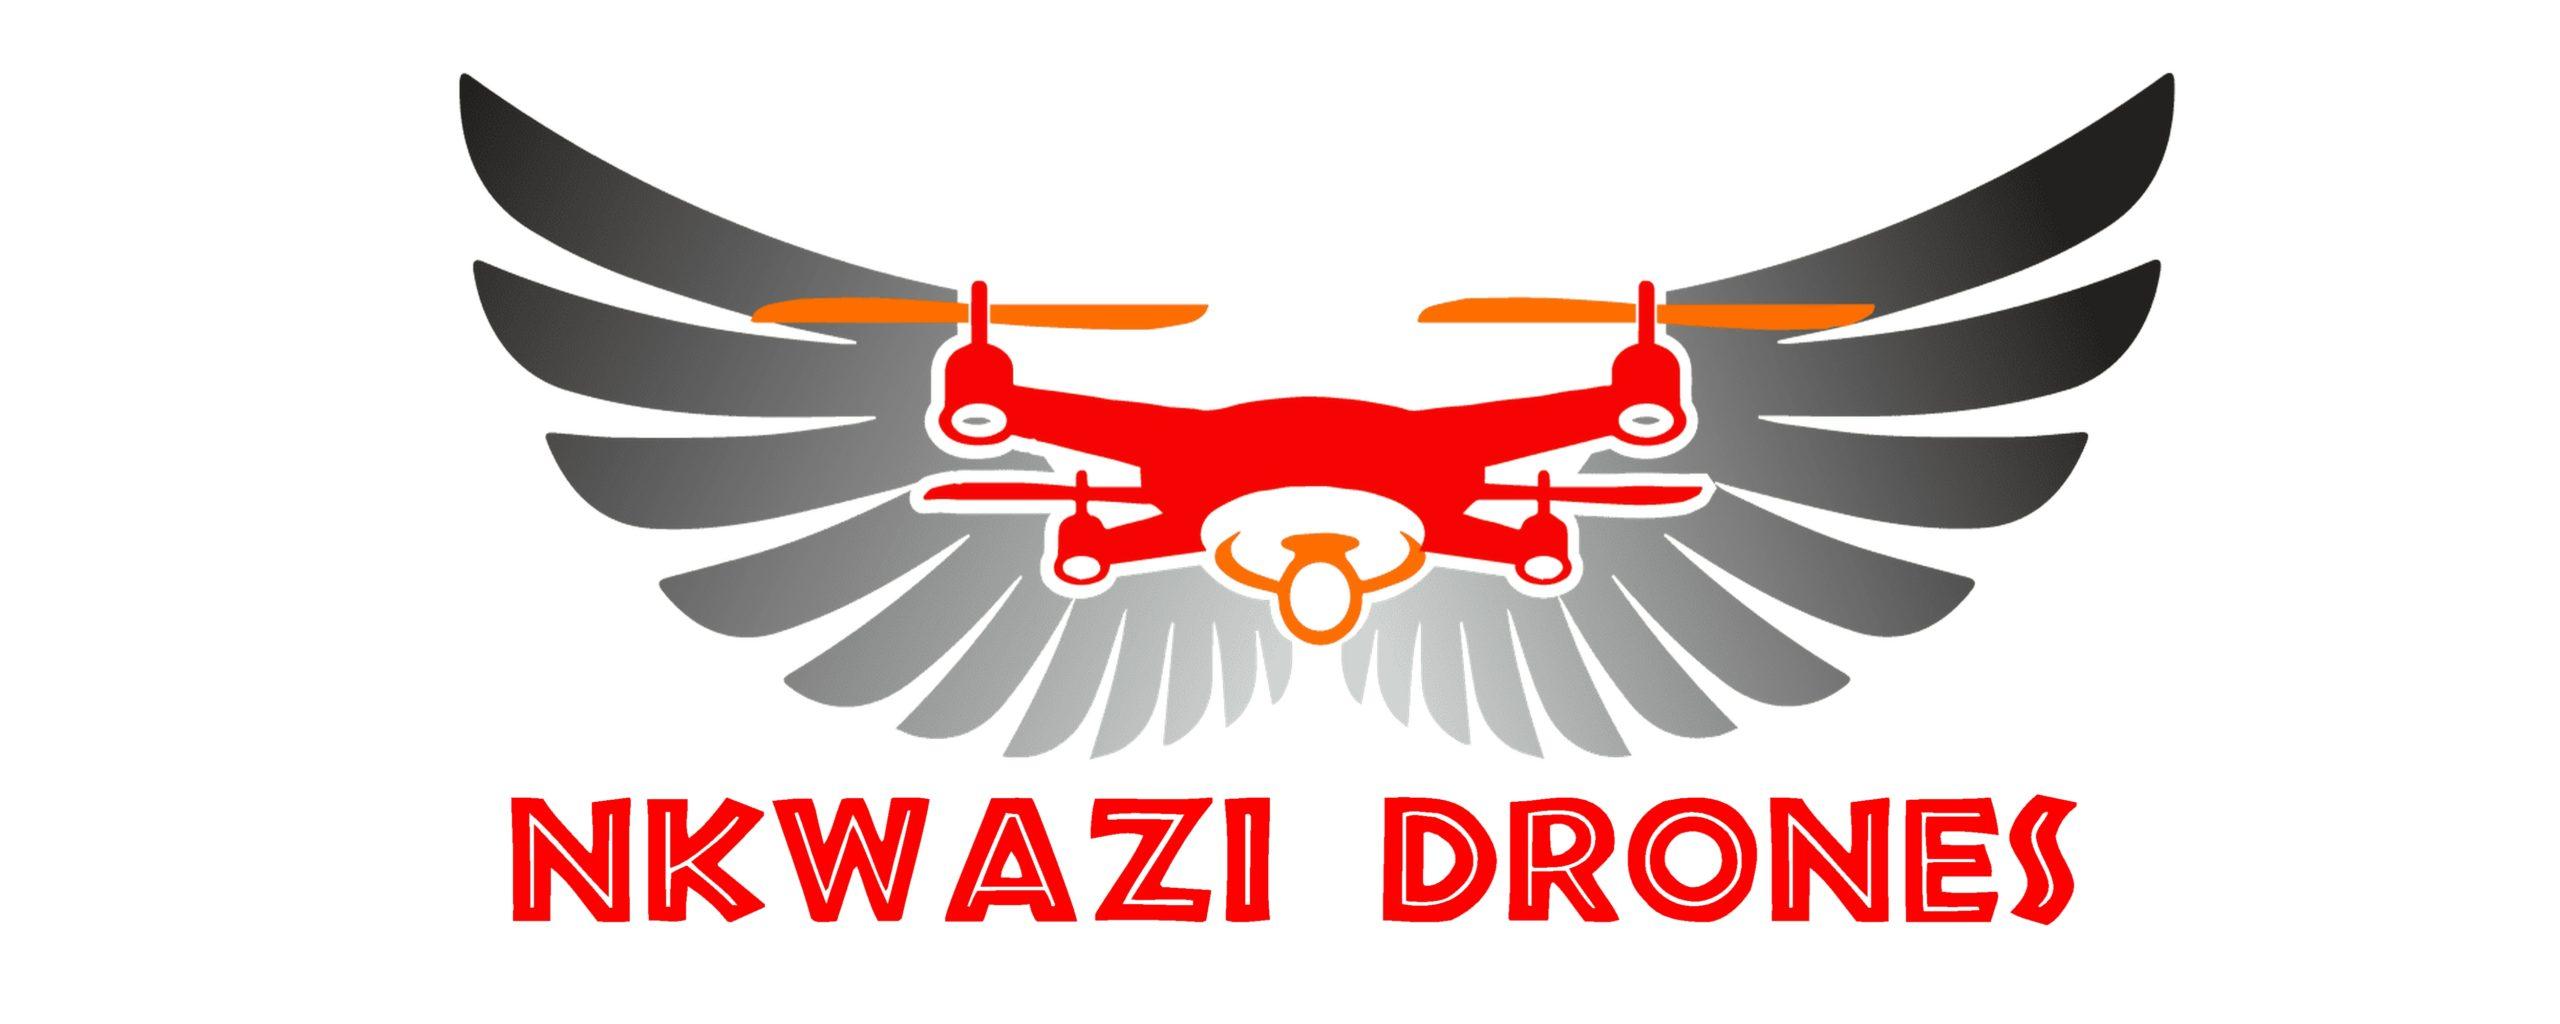 Nkwazi Drones (Pty) Ltd, Gauteng, South Africa